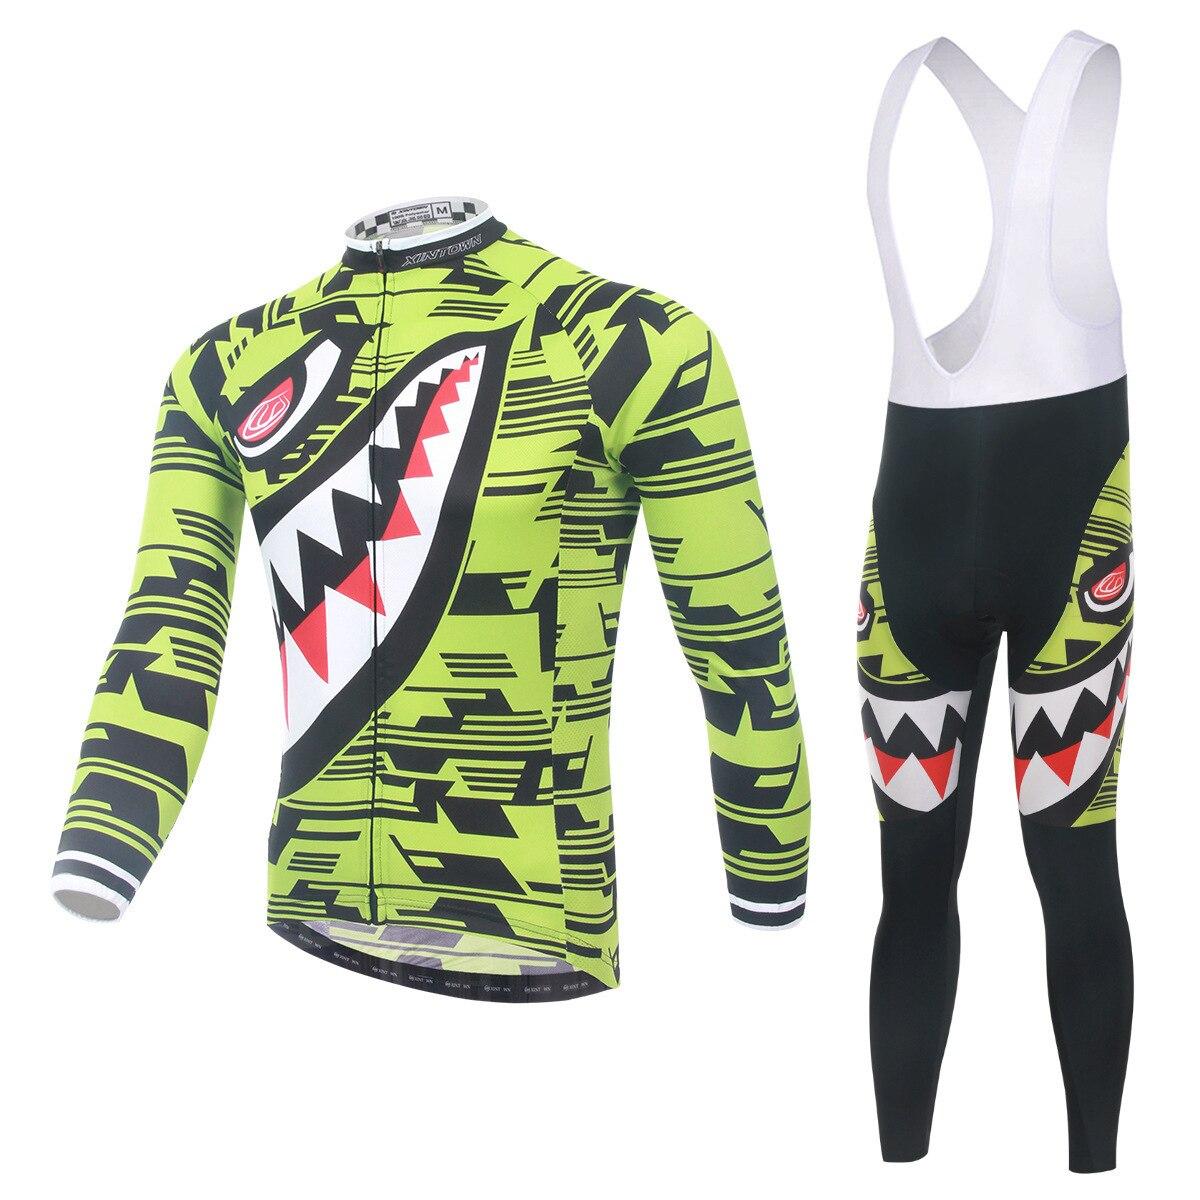 BOODUN Shark Riding Suit Straps Long Sleeve Suit Bicycle Serve Catch Down Windbreak Keep Warm Function Underwear